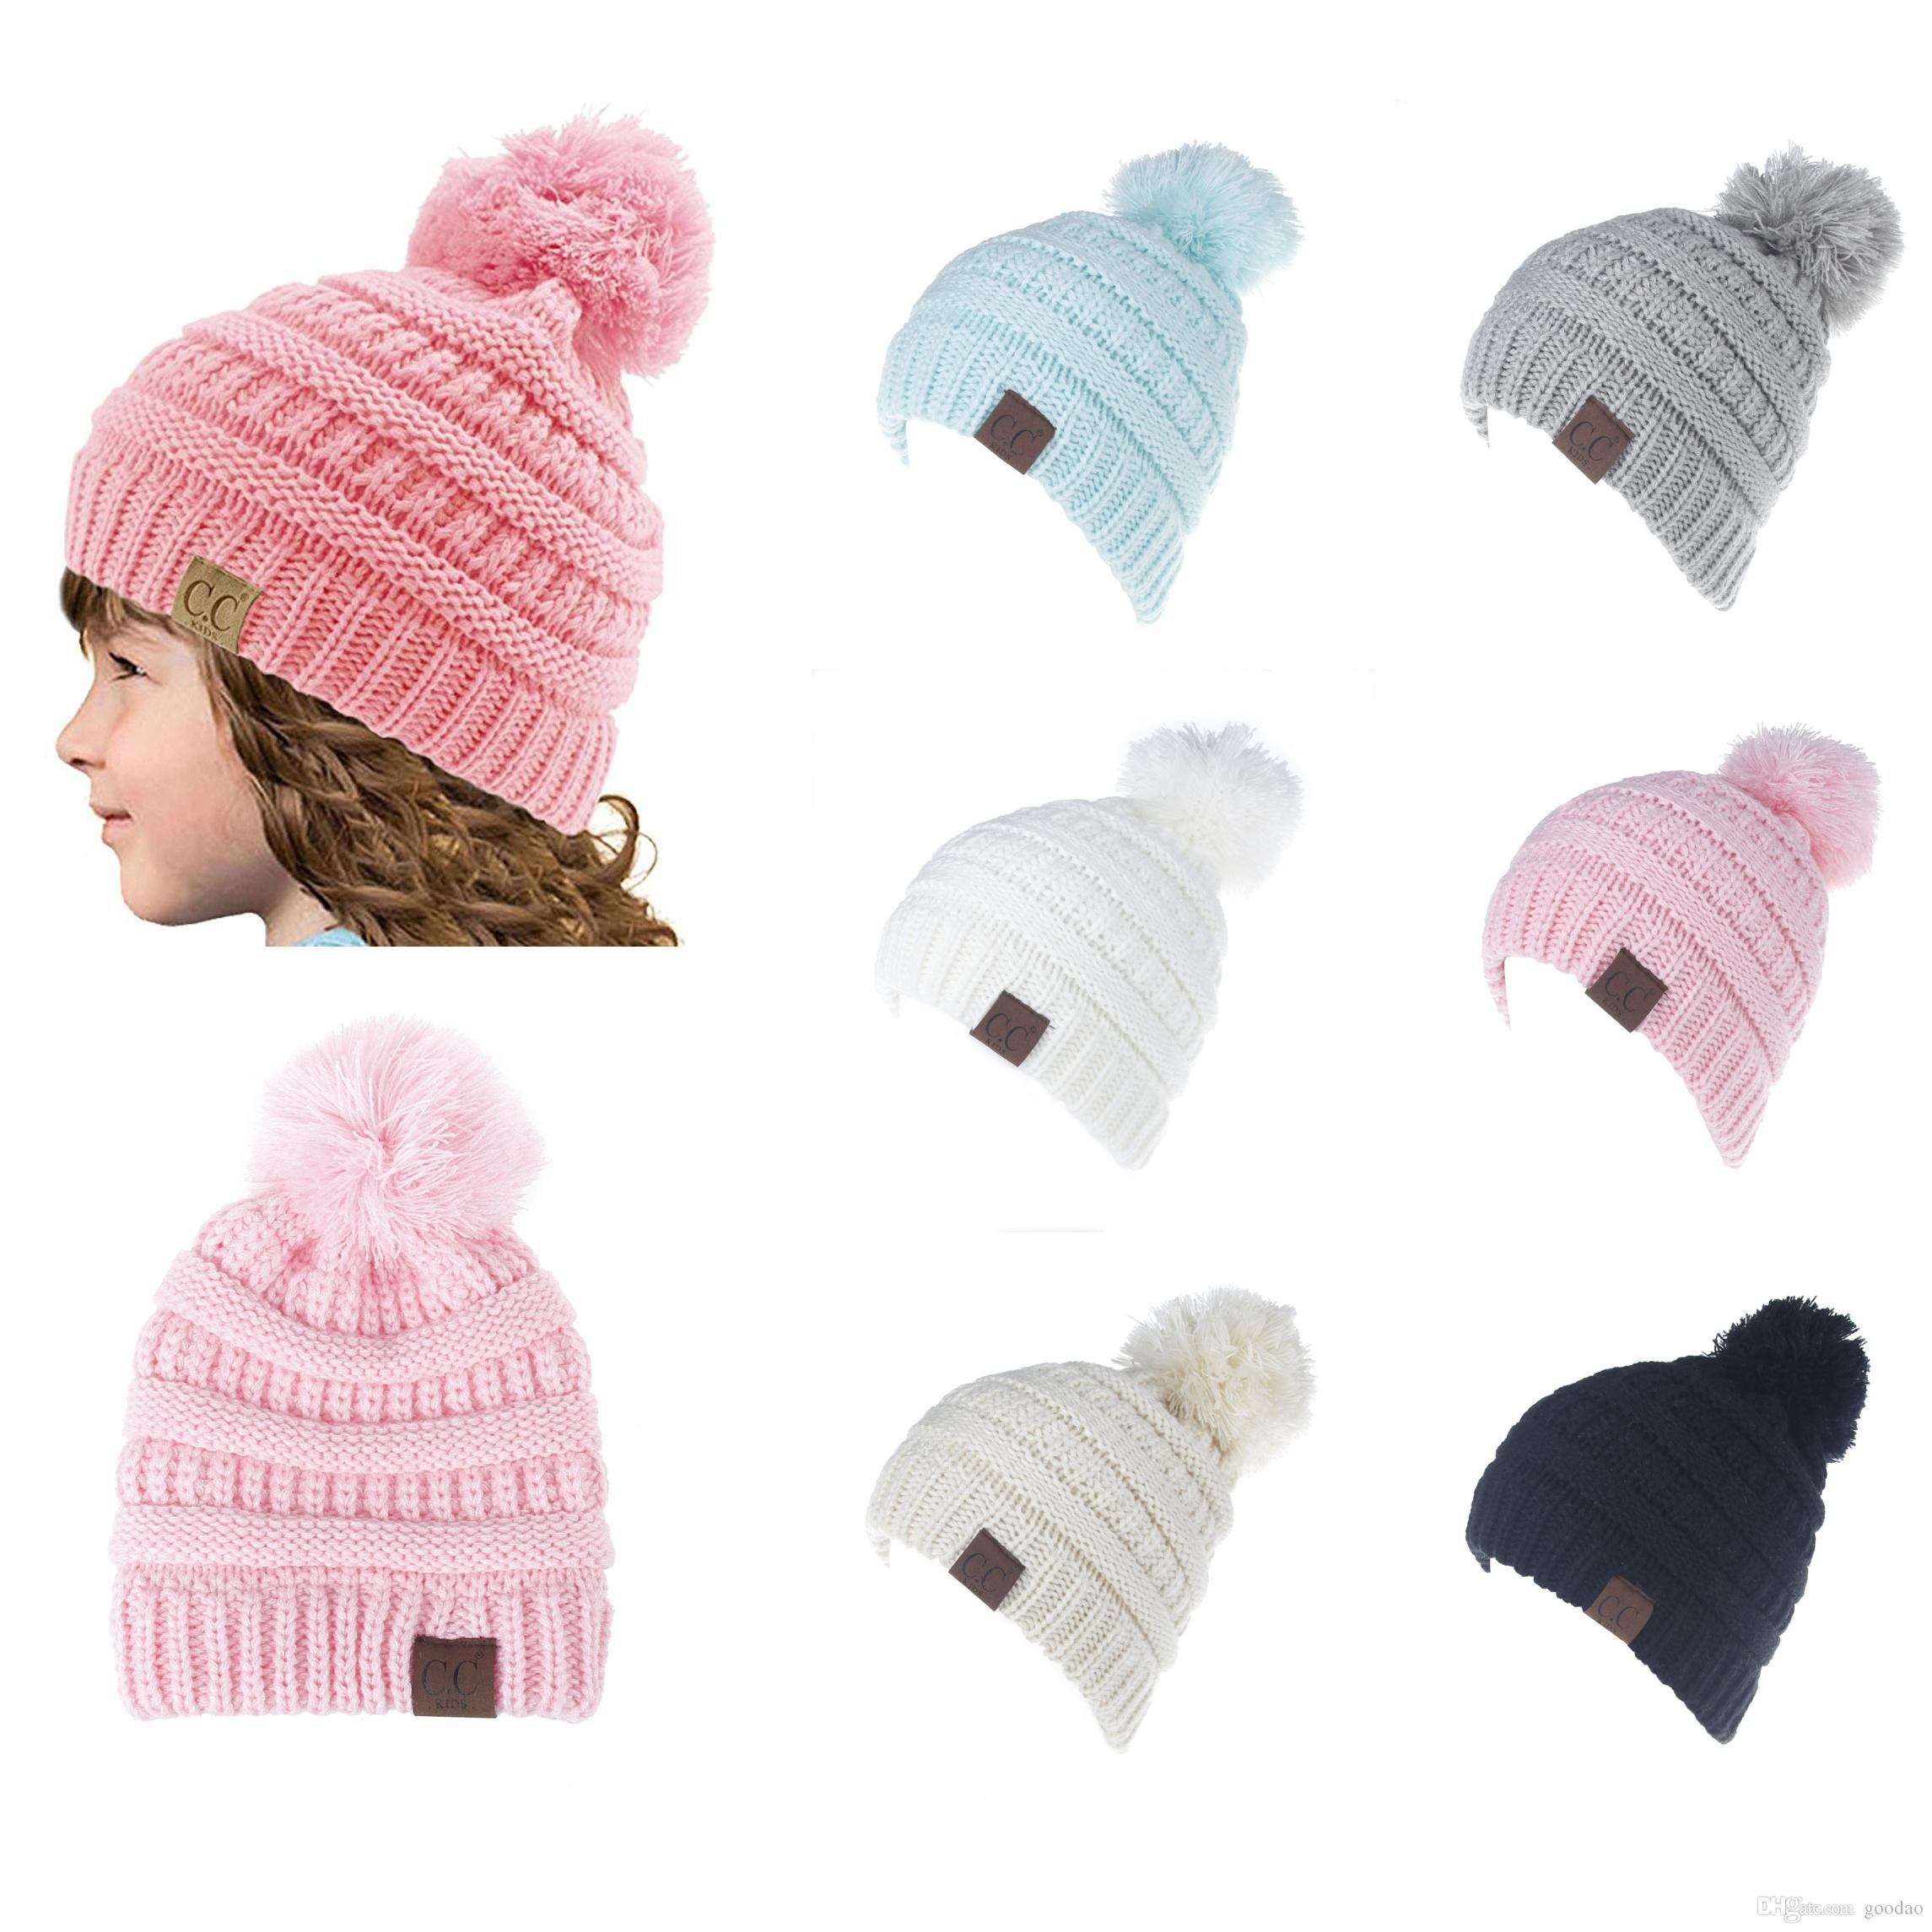 2017 New CC Trendy Beanie Knitted Hats Kids Chunky Skull Caps ... ccb07058b245